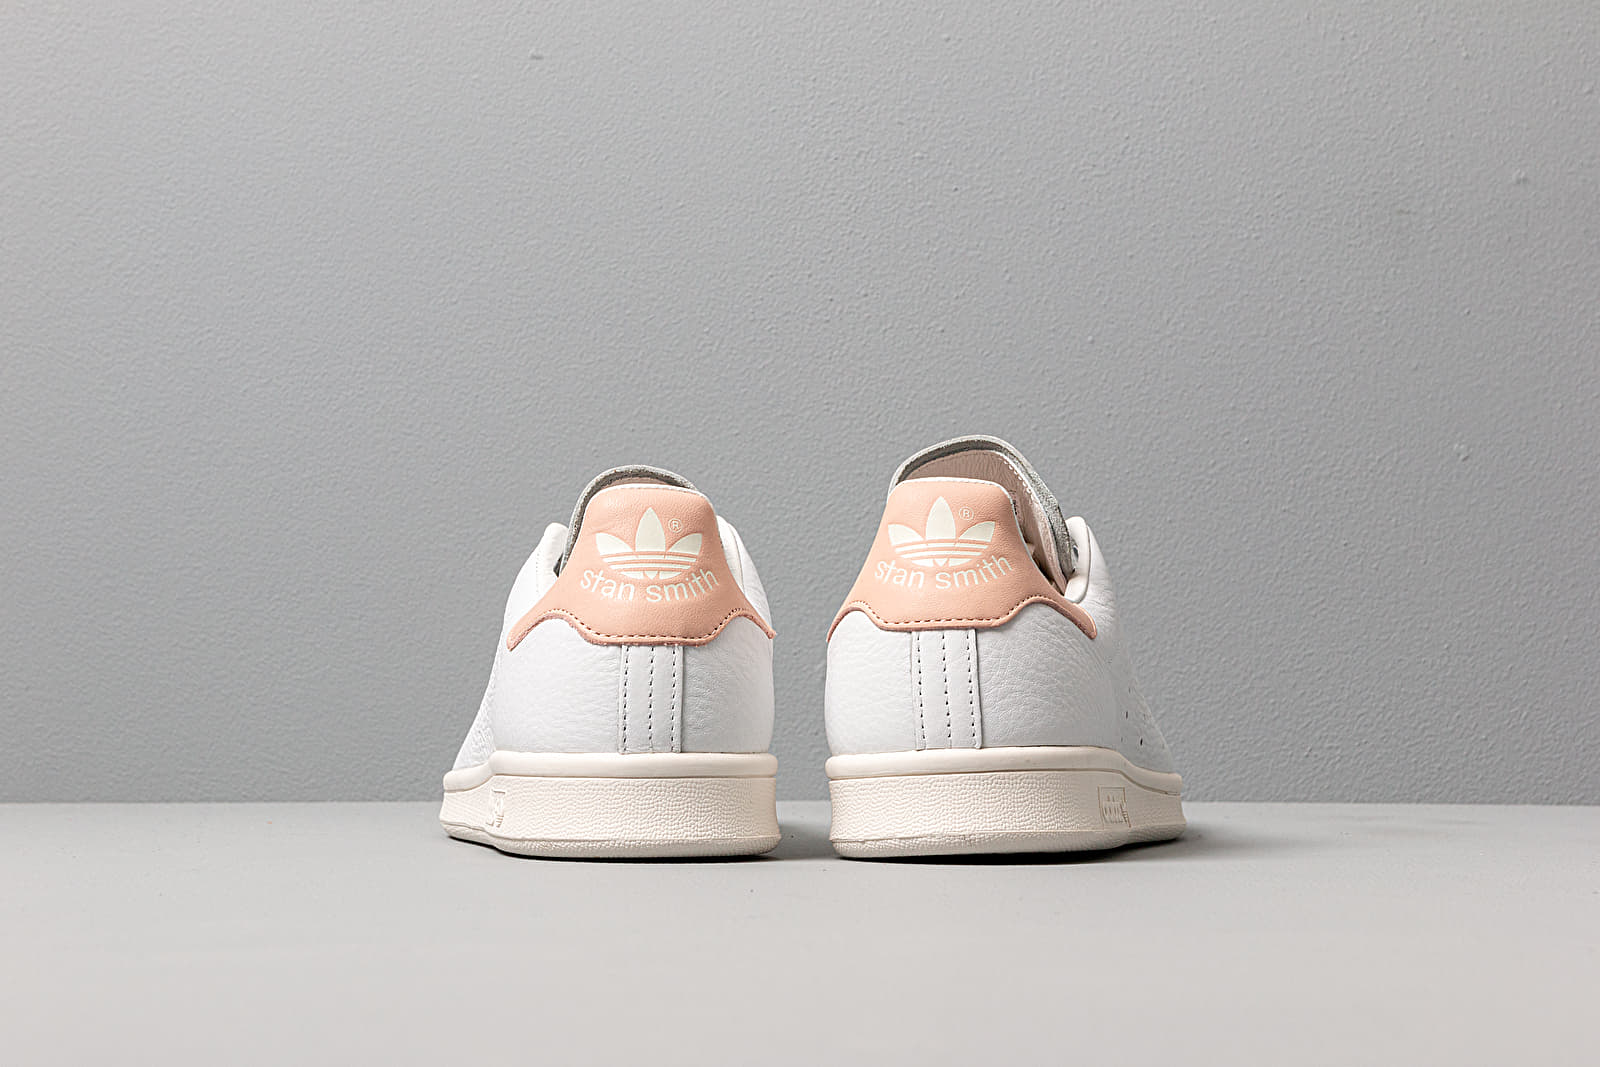 Pocos de madera Descanso  Men's shoes adidas Stan Smith Ftw White/ Vapor Pink/ Off White